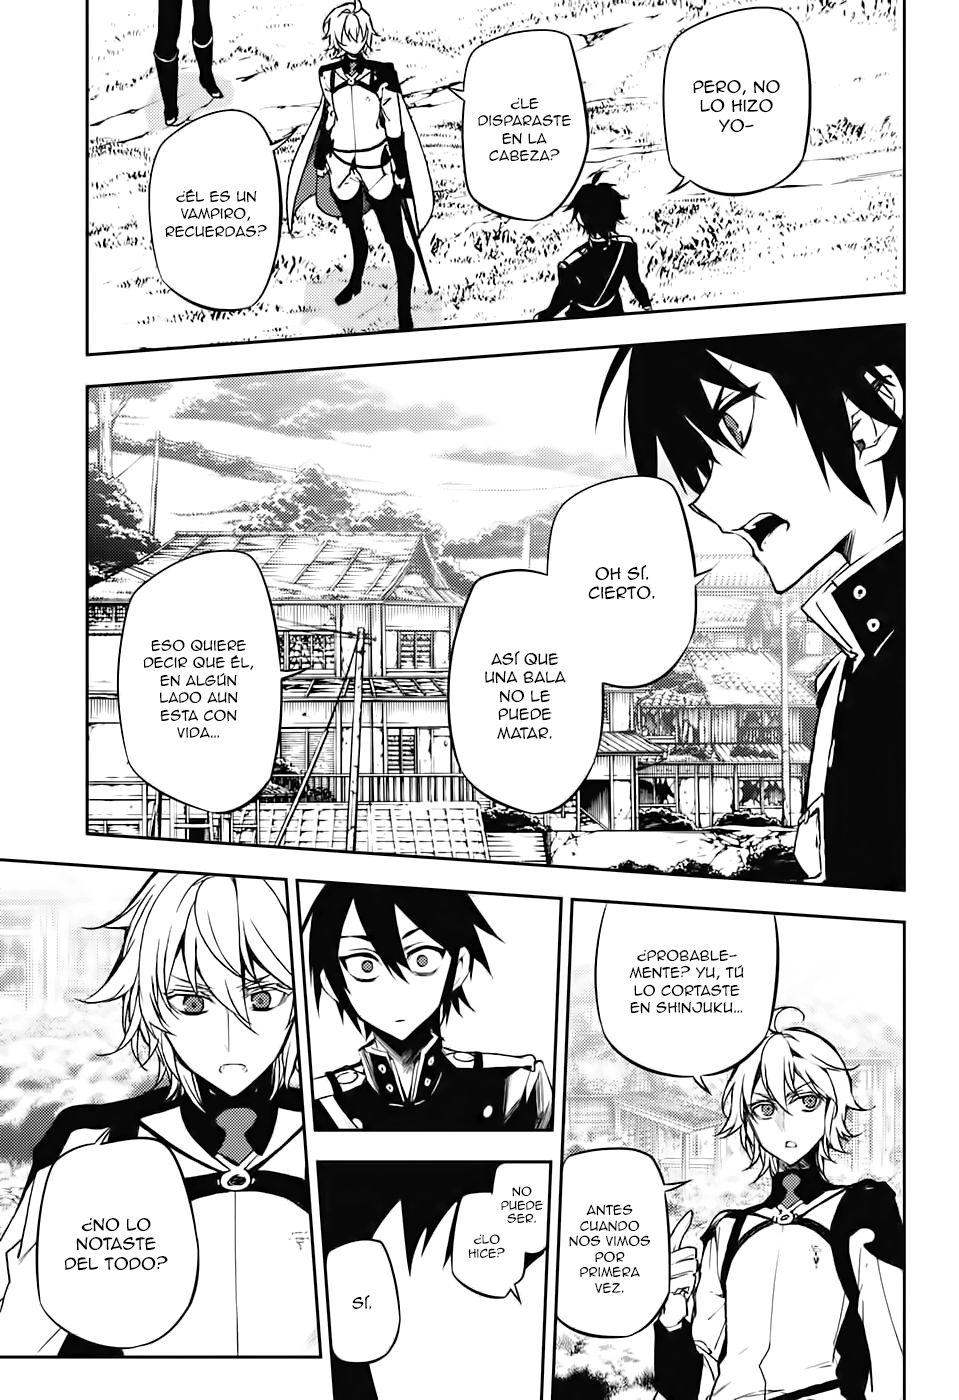 http://c5.ninemanga.com/es_manga/49/3057/454384/4e29c8572edb3e6c1a0eaad5ad36423e.jpg Page 10